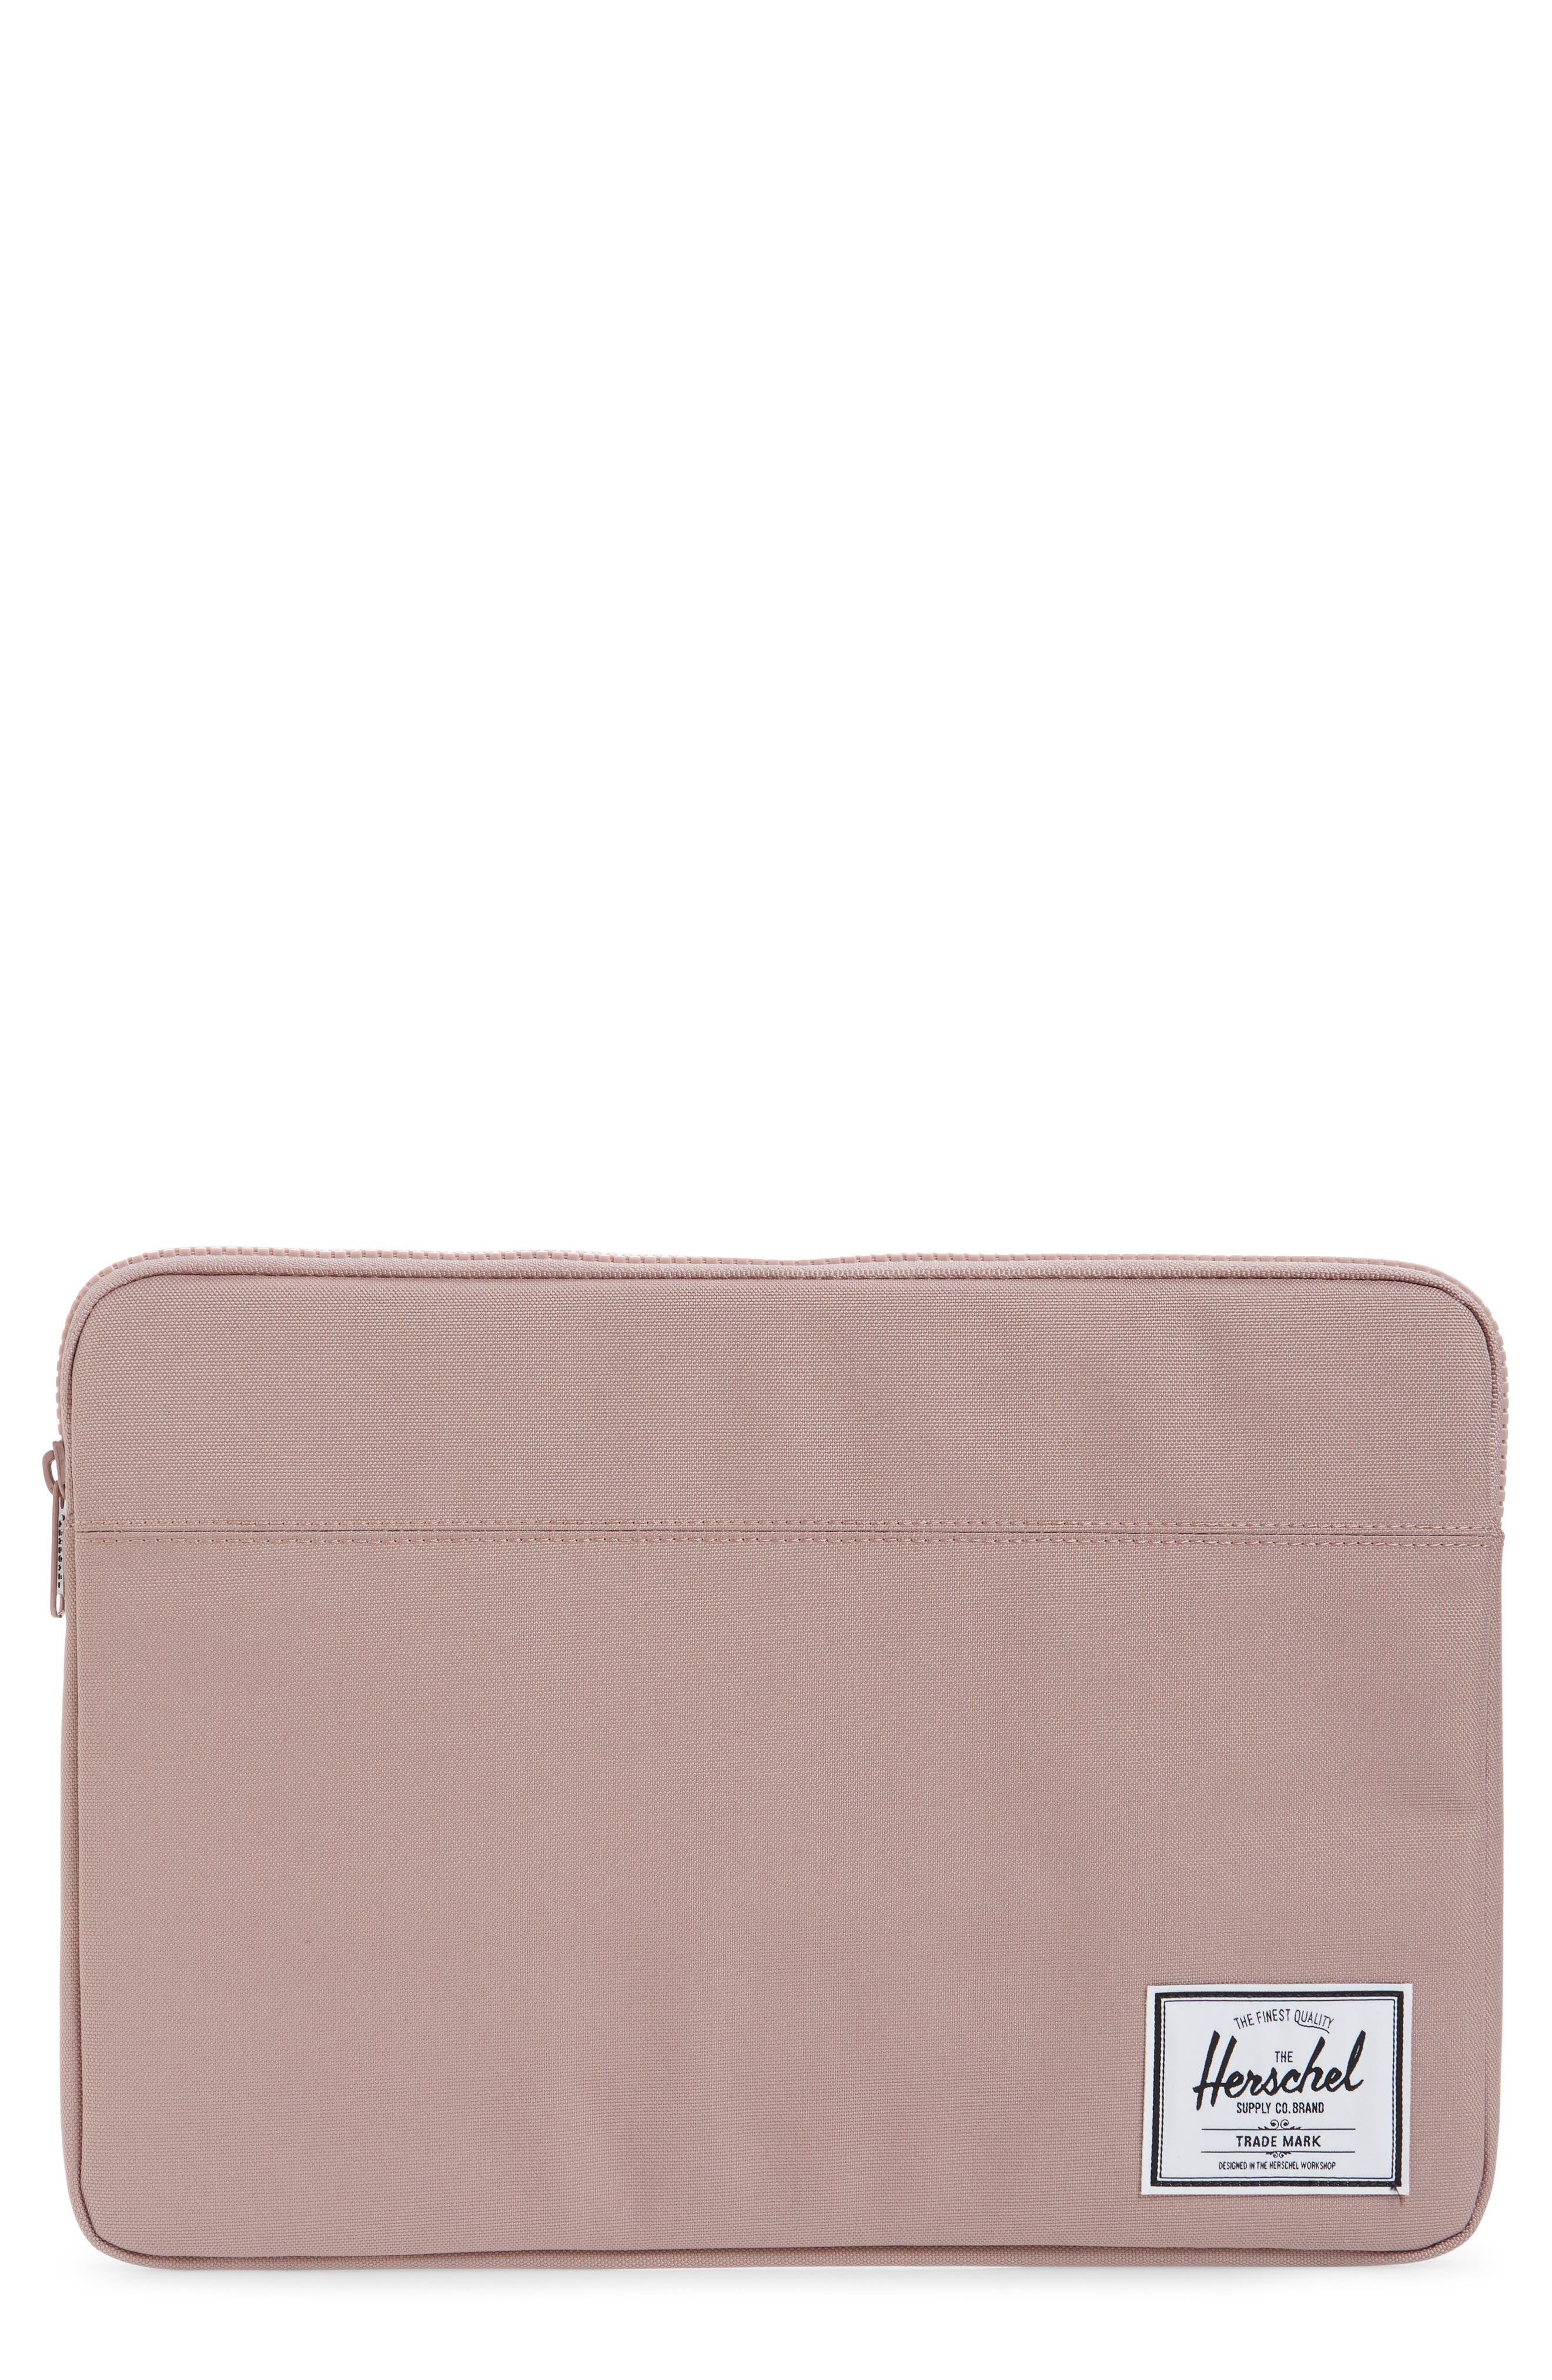 Anchor 15-Inch Macbook Sleeve